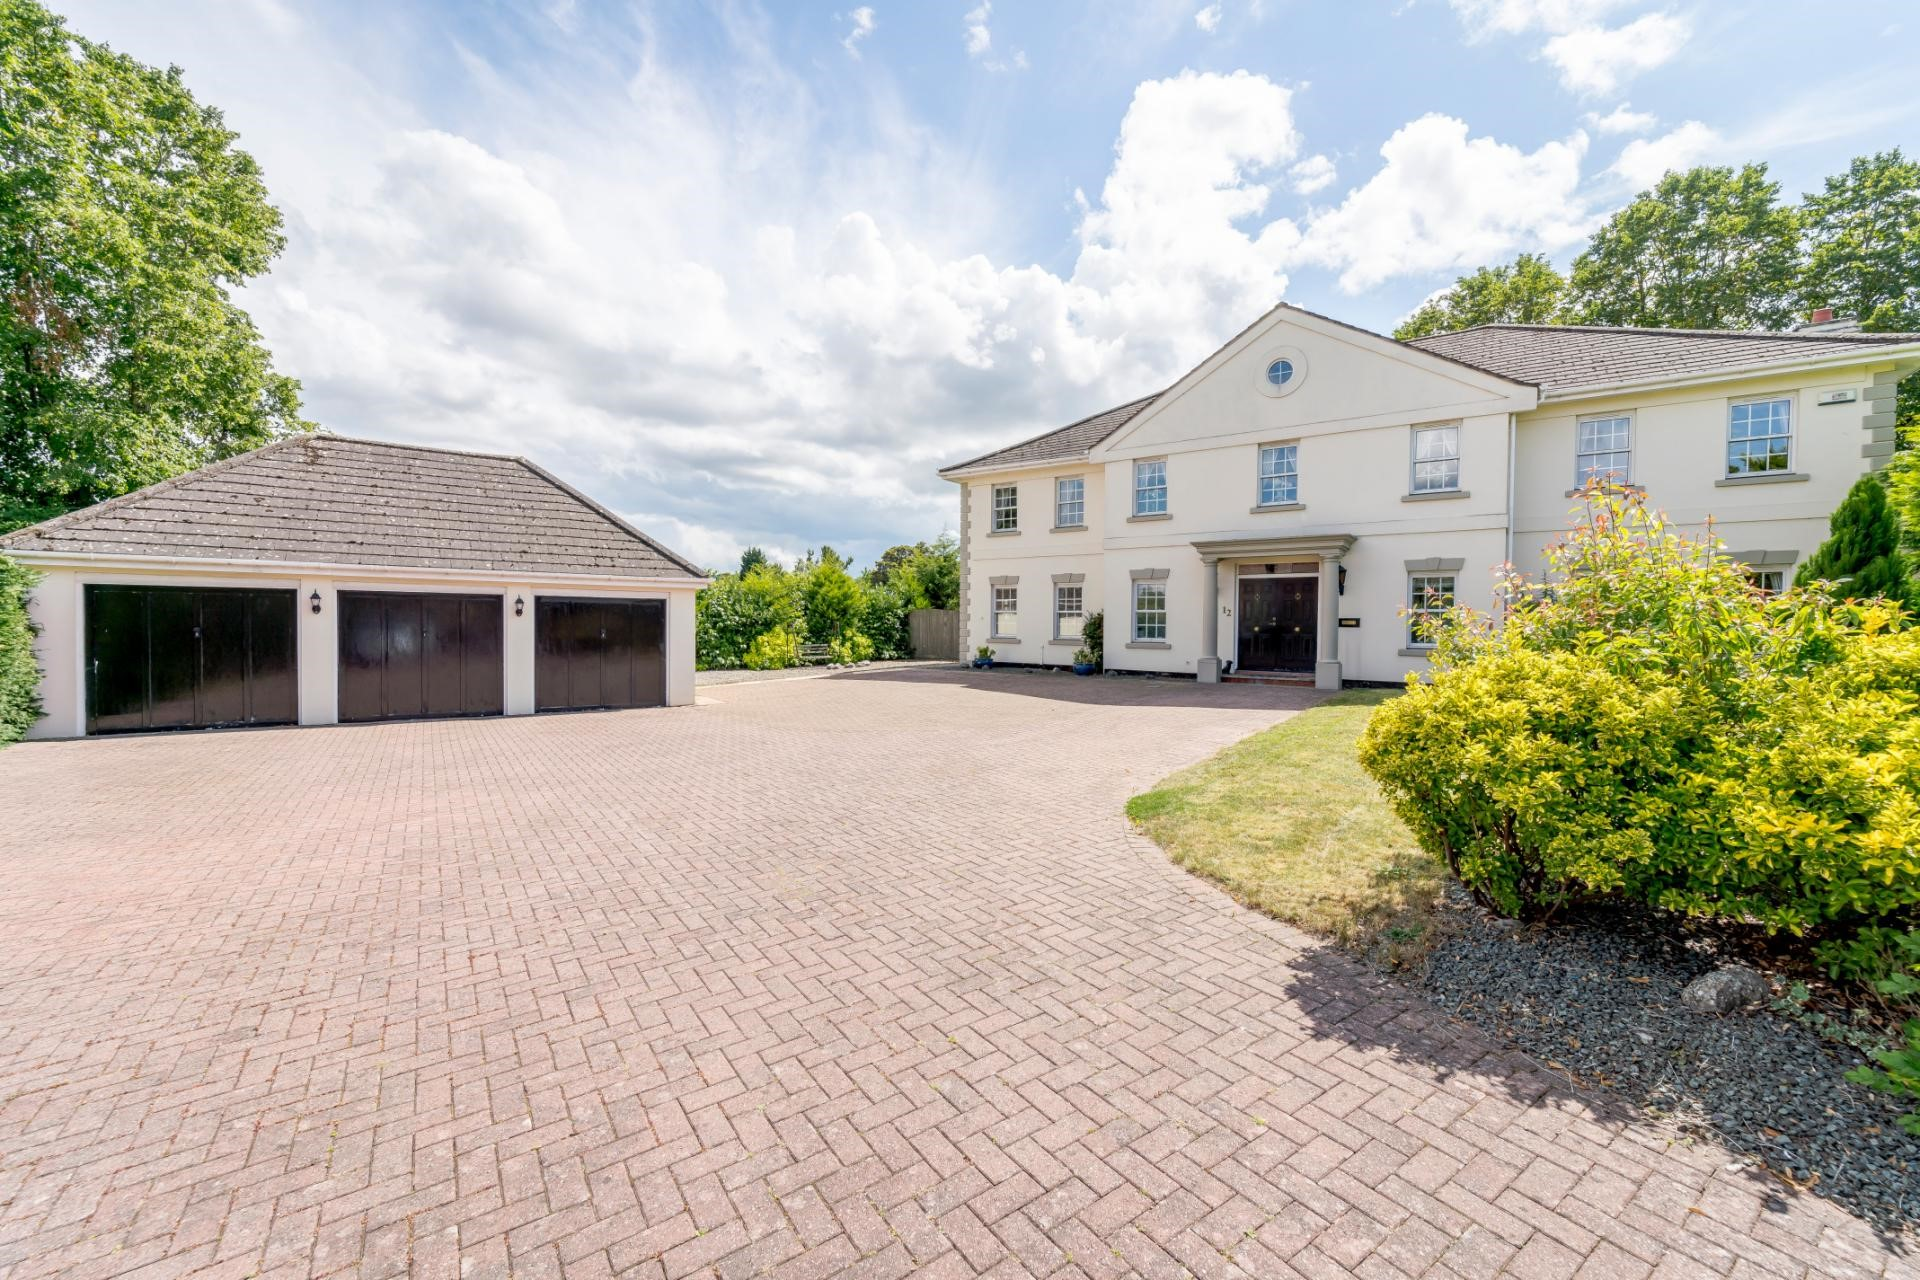 luxury_housing_development_white_palatial_home